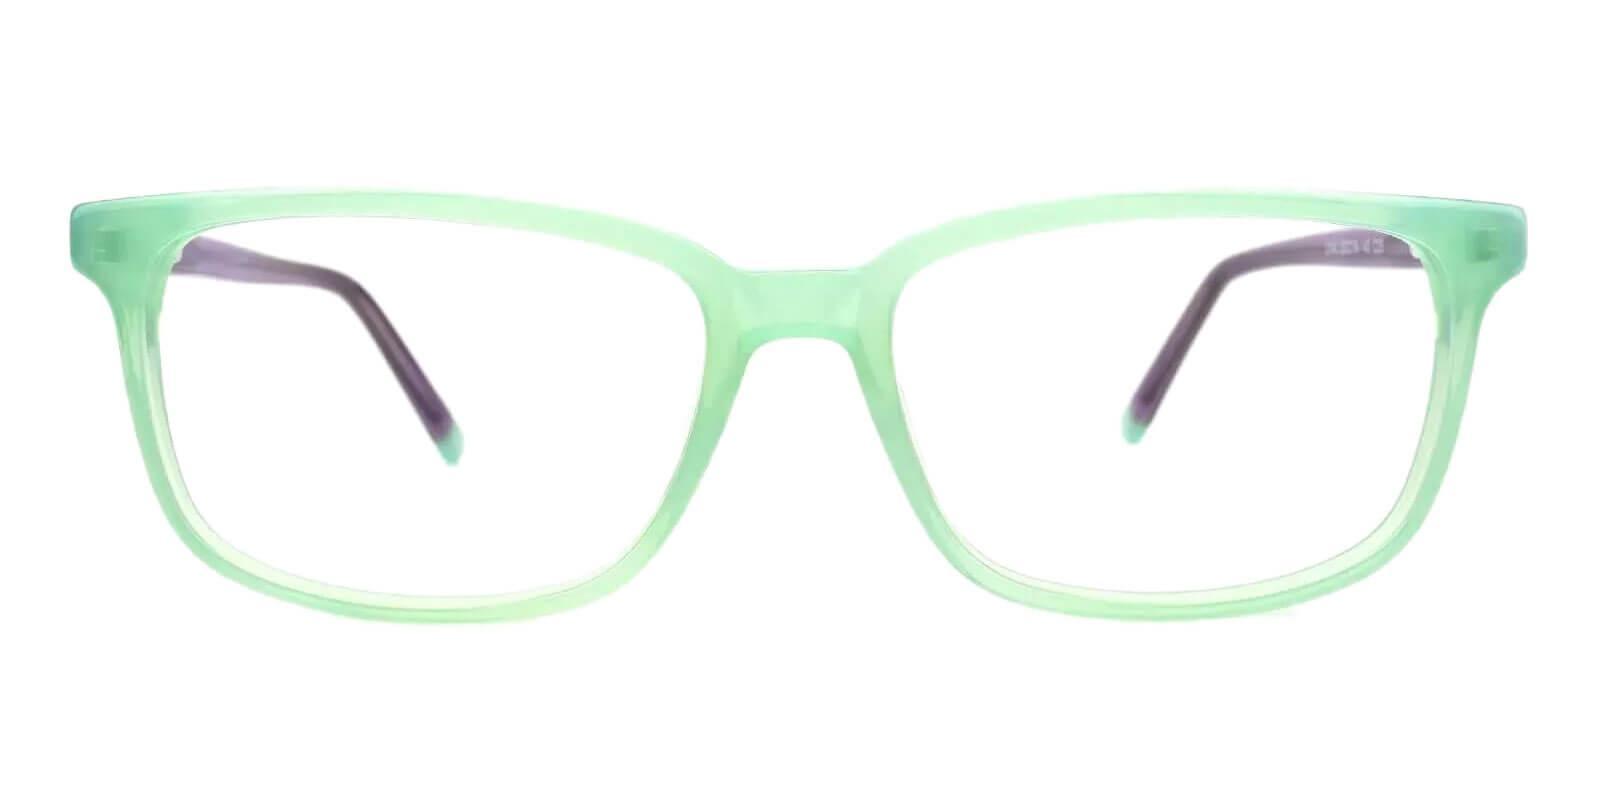 Leupp Corner Green Acetate Eyeglasses , SpringHinges , UniversalBridgeFit Frames from ABBE Glasses